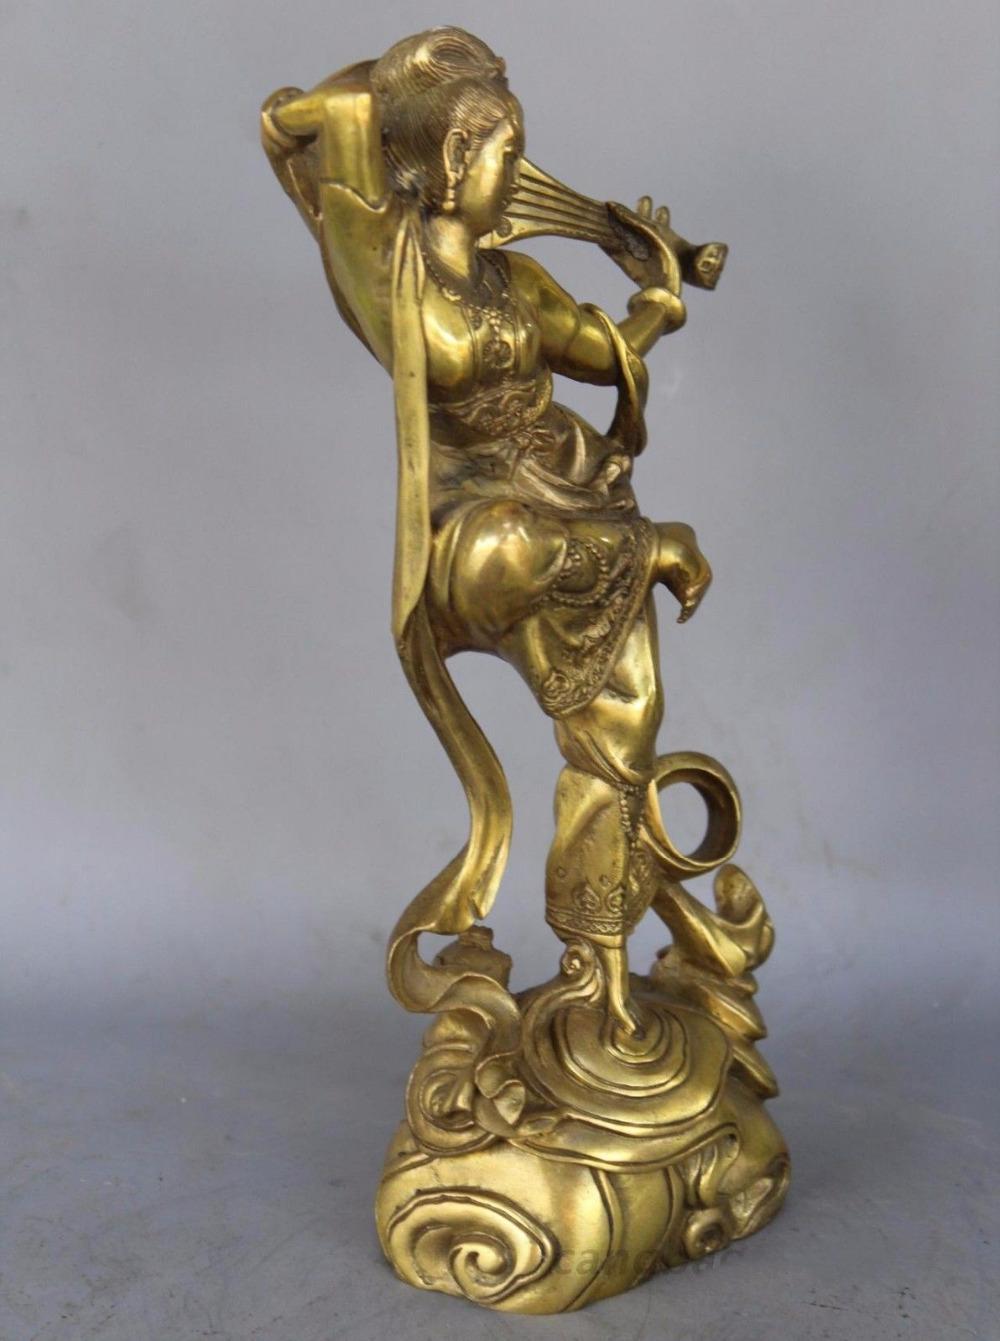 Dunhuang красота бронзовая статуя отскок Pipa Lute Fairy украшения дома